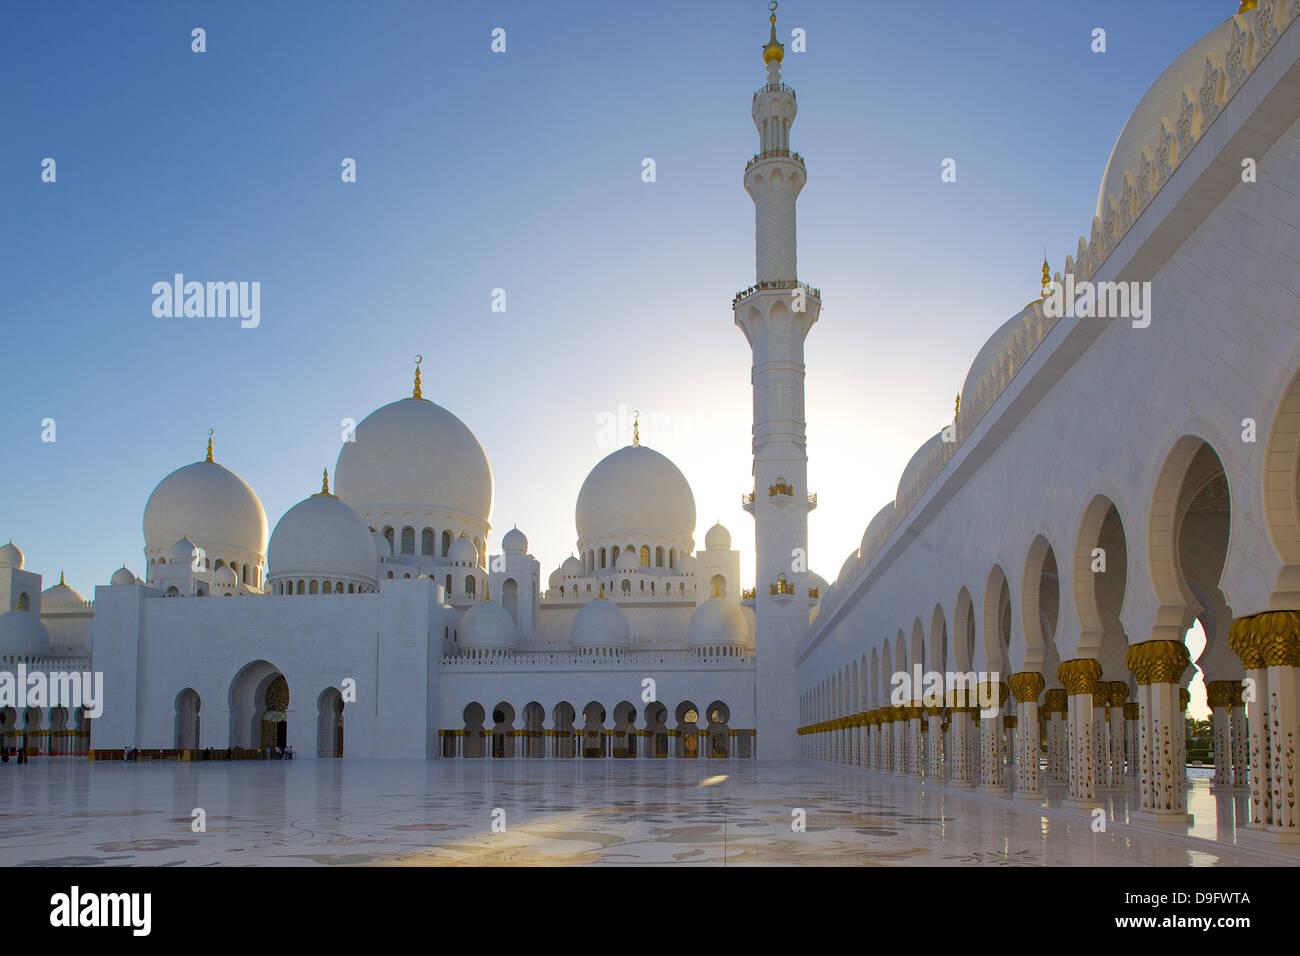 Sheikh Zayed Bin Sultan Al Nahyan Mosque, Abu Dhabi, United Arab Emirates, Middle East Stock Photo